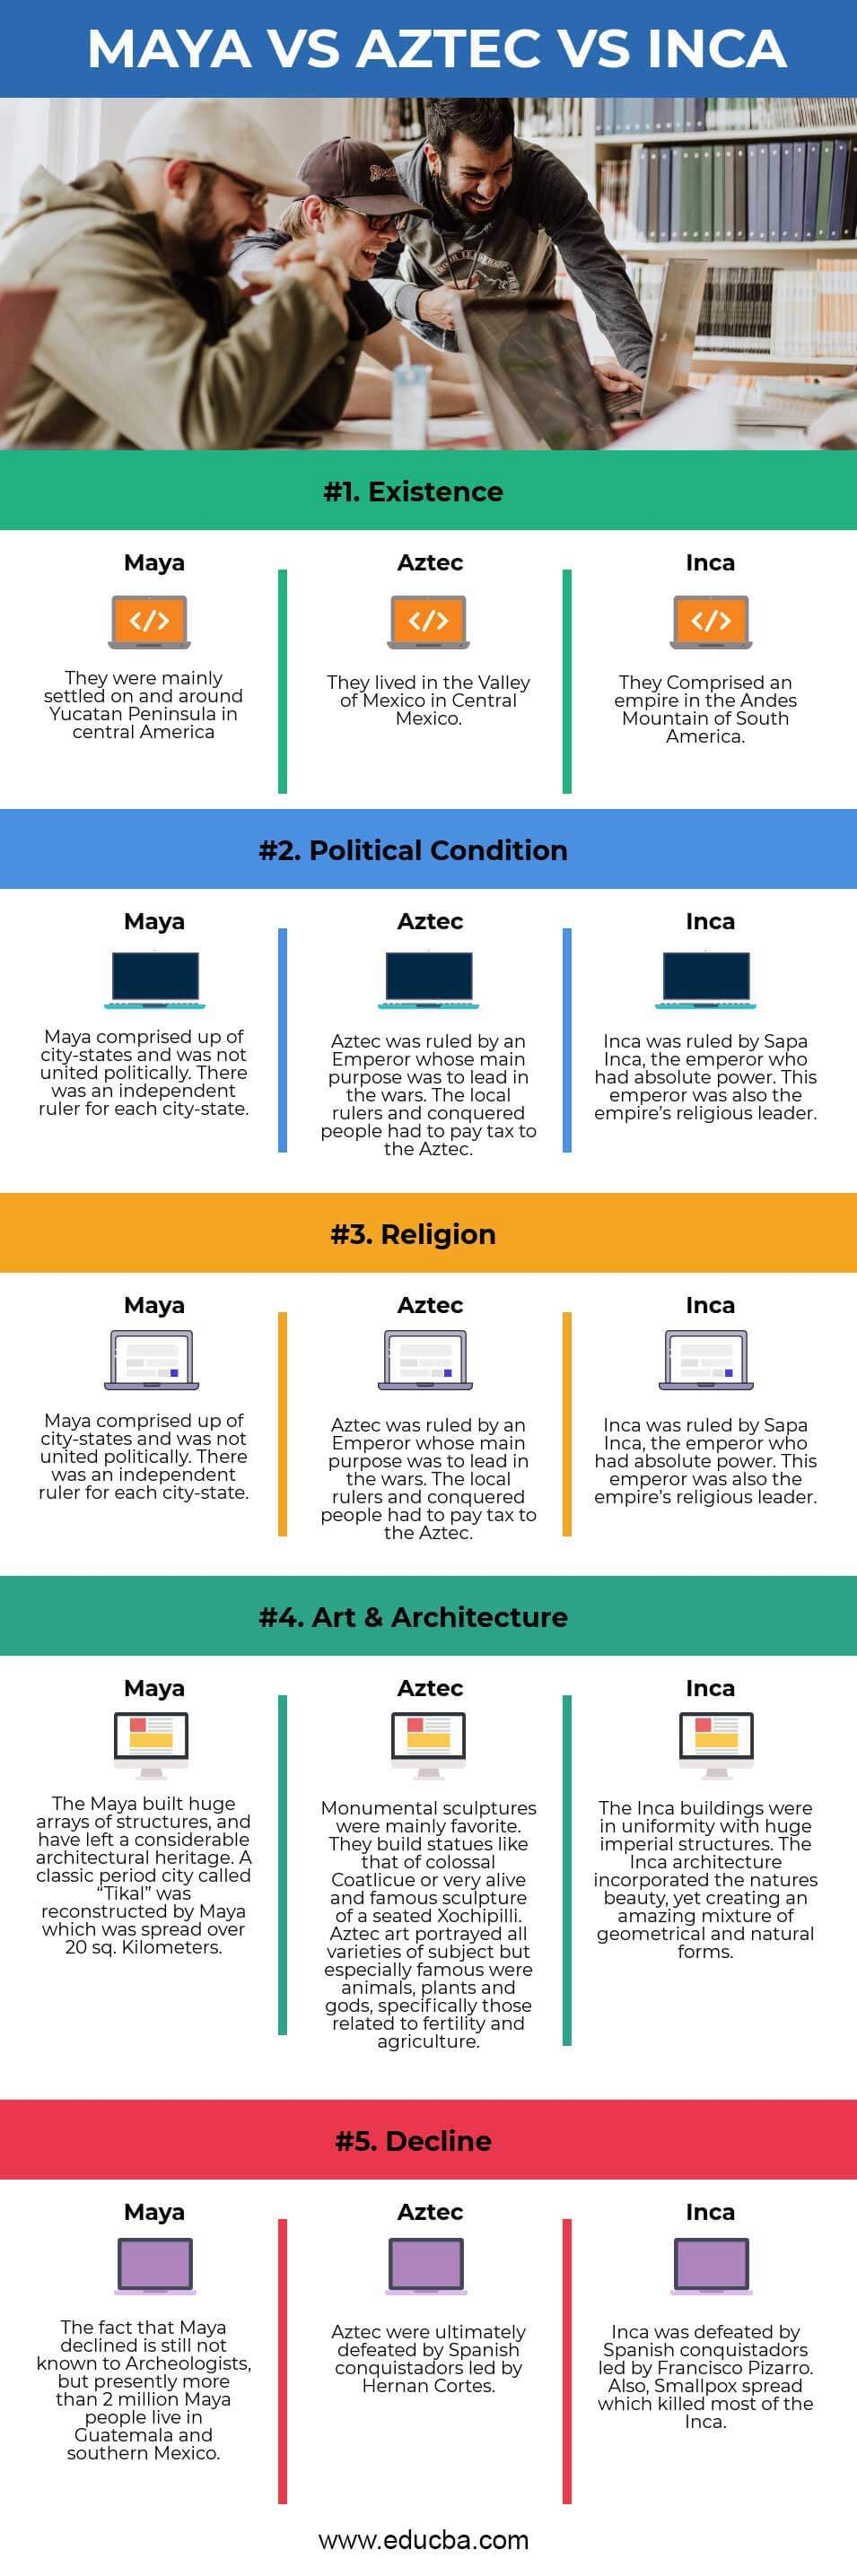 MAYA-VS-AZTEC-VS-INCA